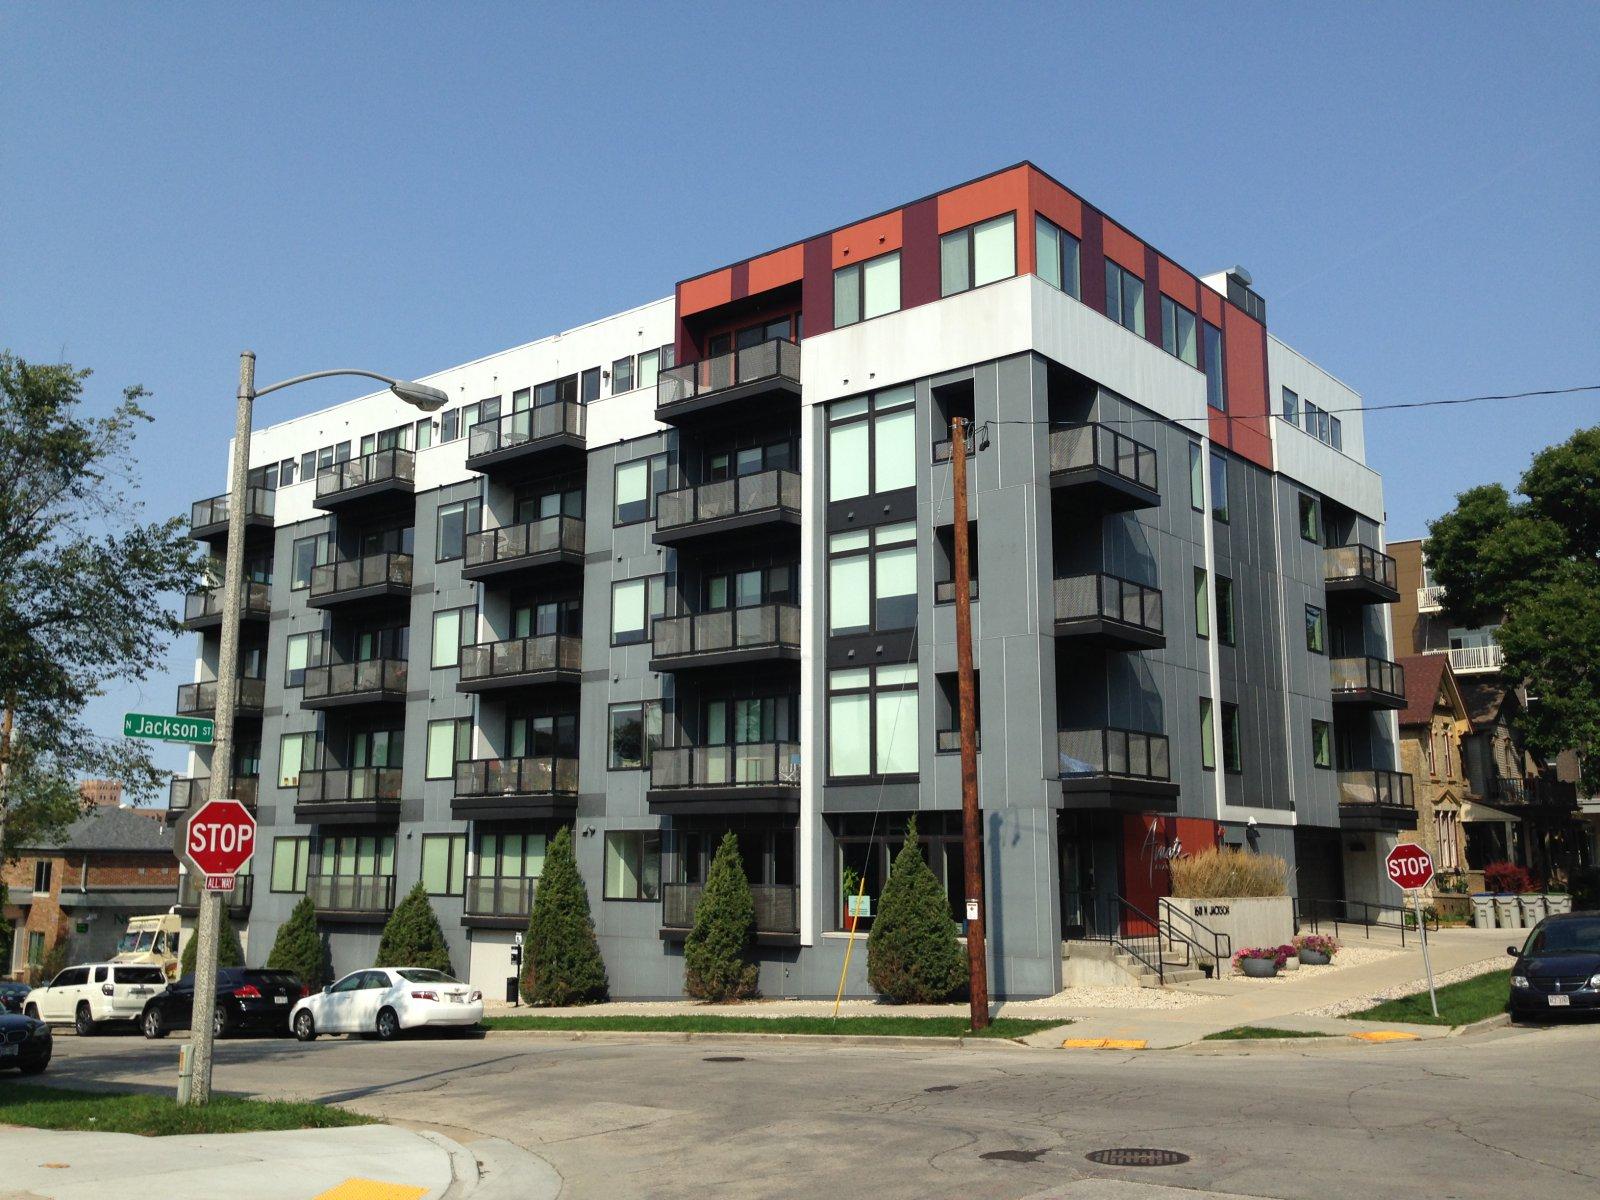 Avante Apartments, 1601N. Jackson St.